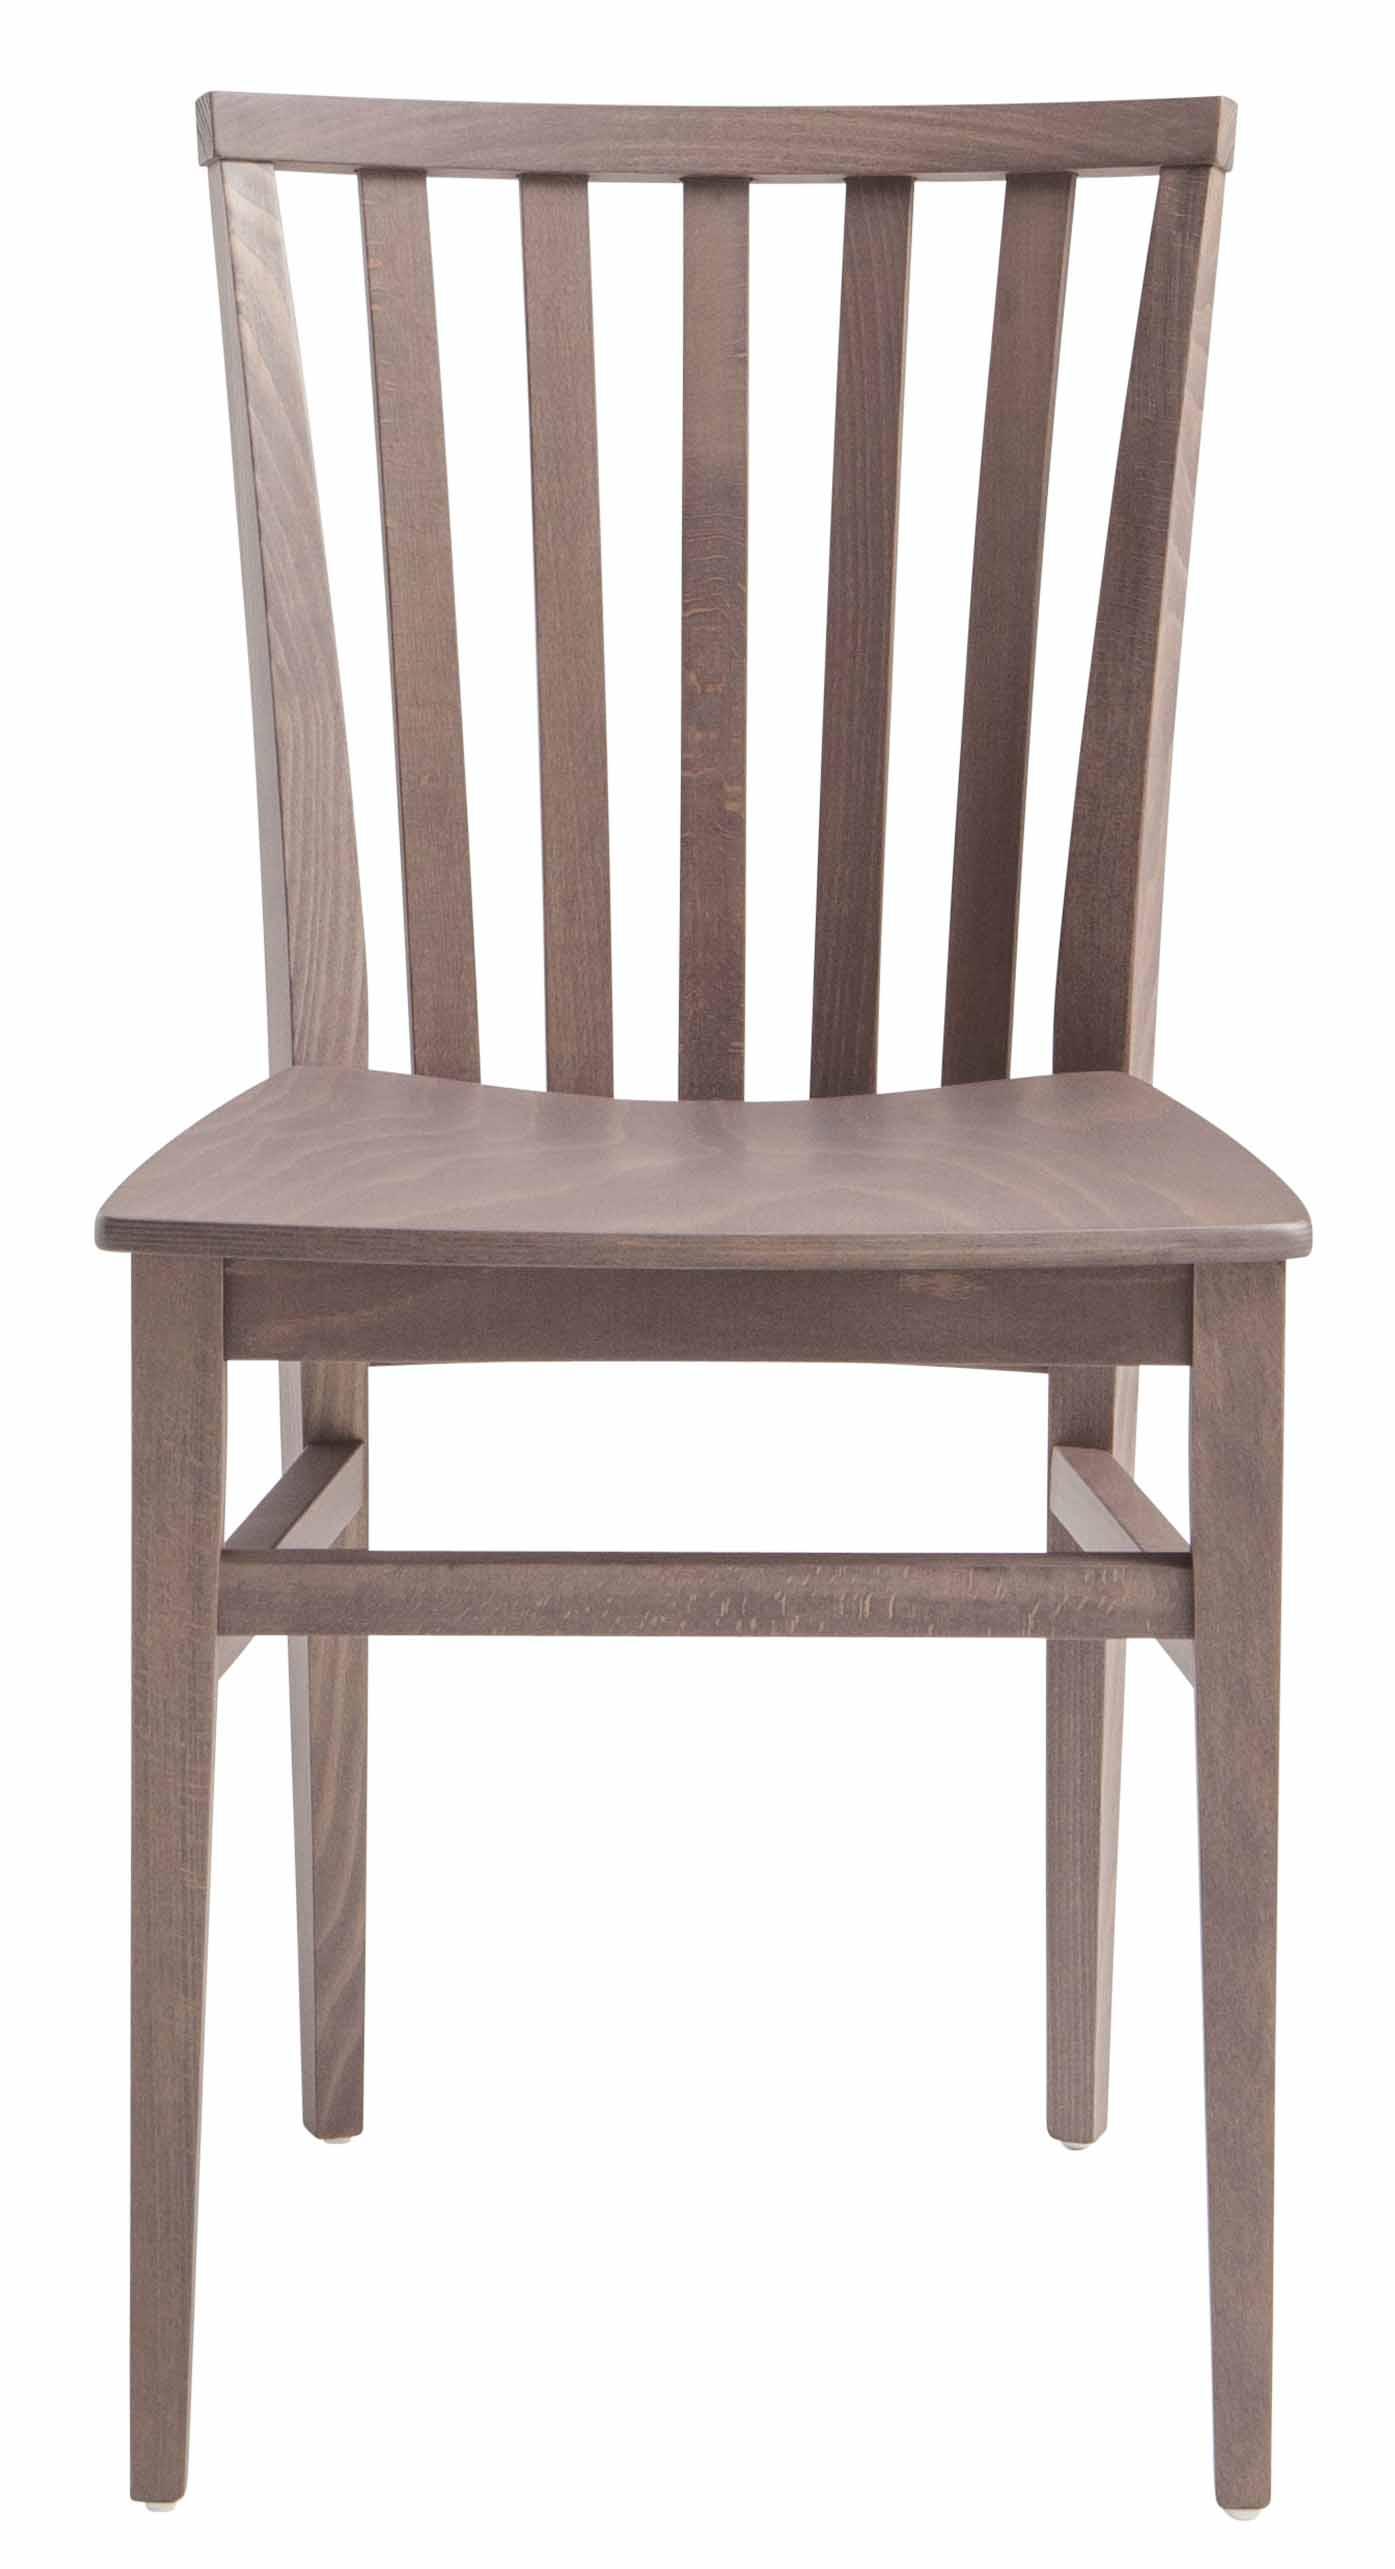 Vendita sedie, tavoli, divani, sgabelli, poltroncine